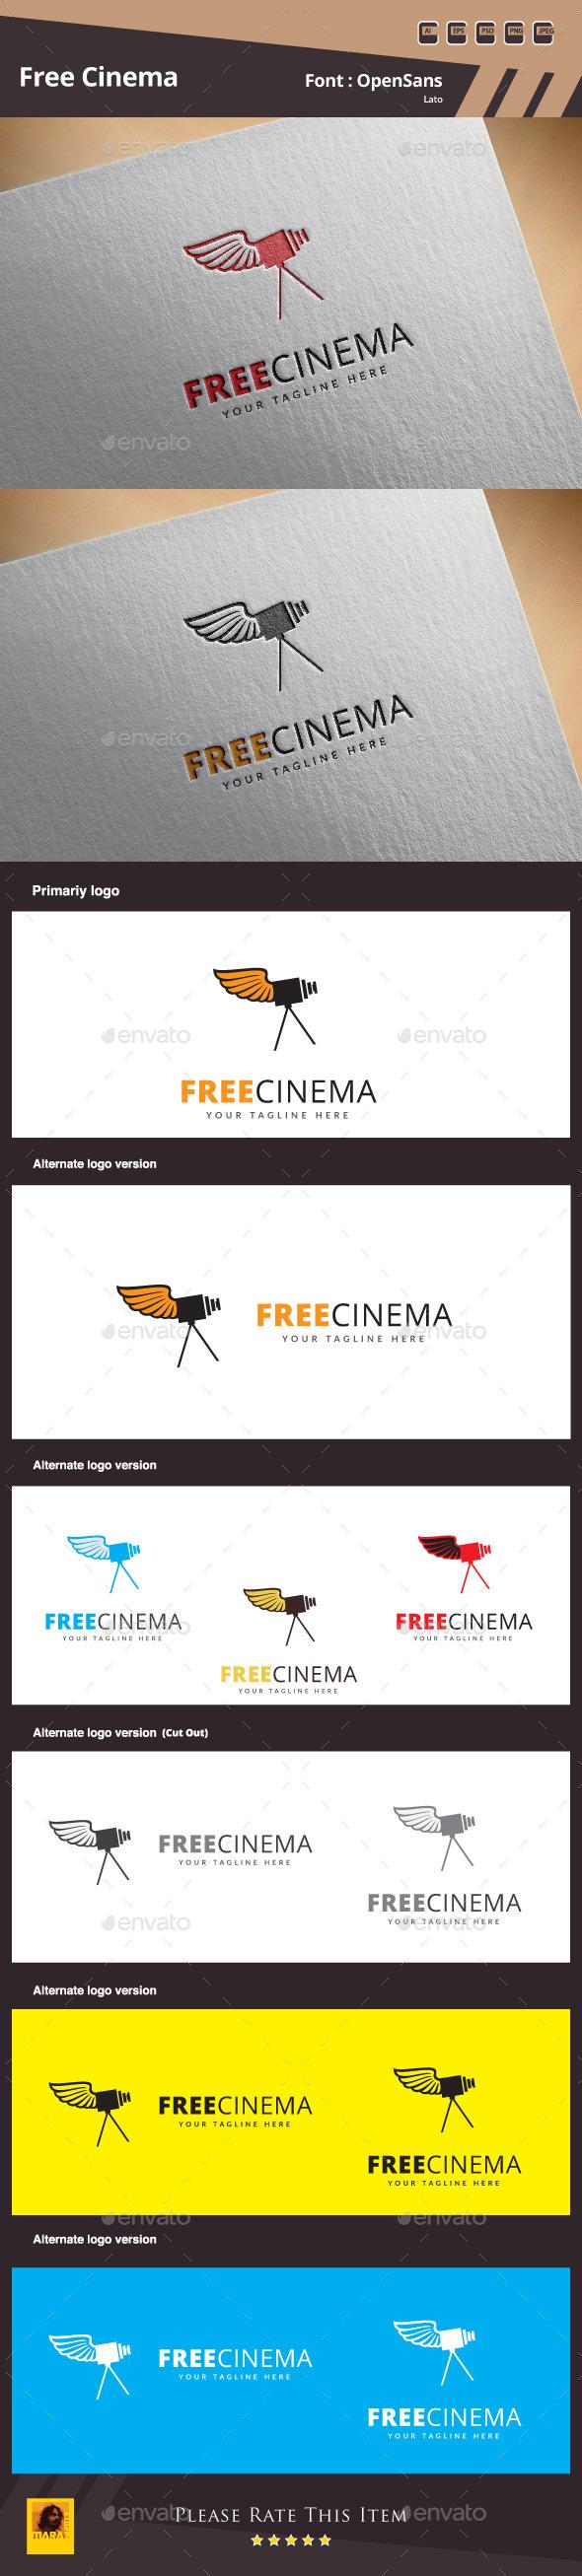 GraphicRiver Free Cinema Logo Template 11356875